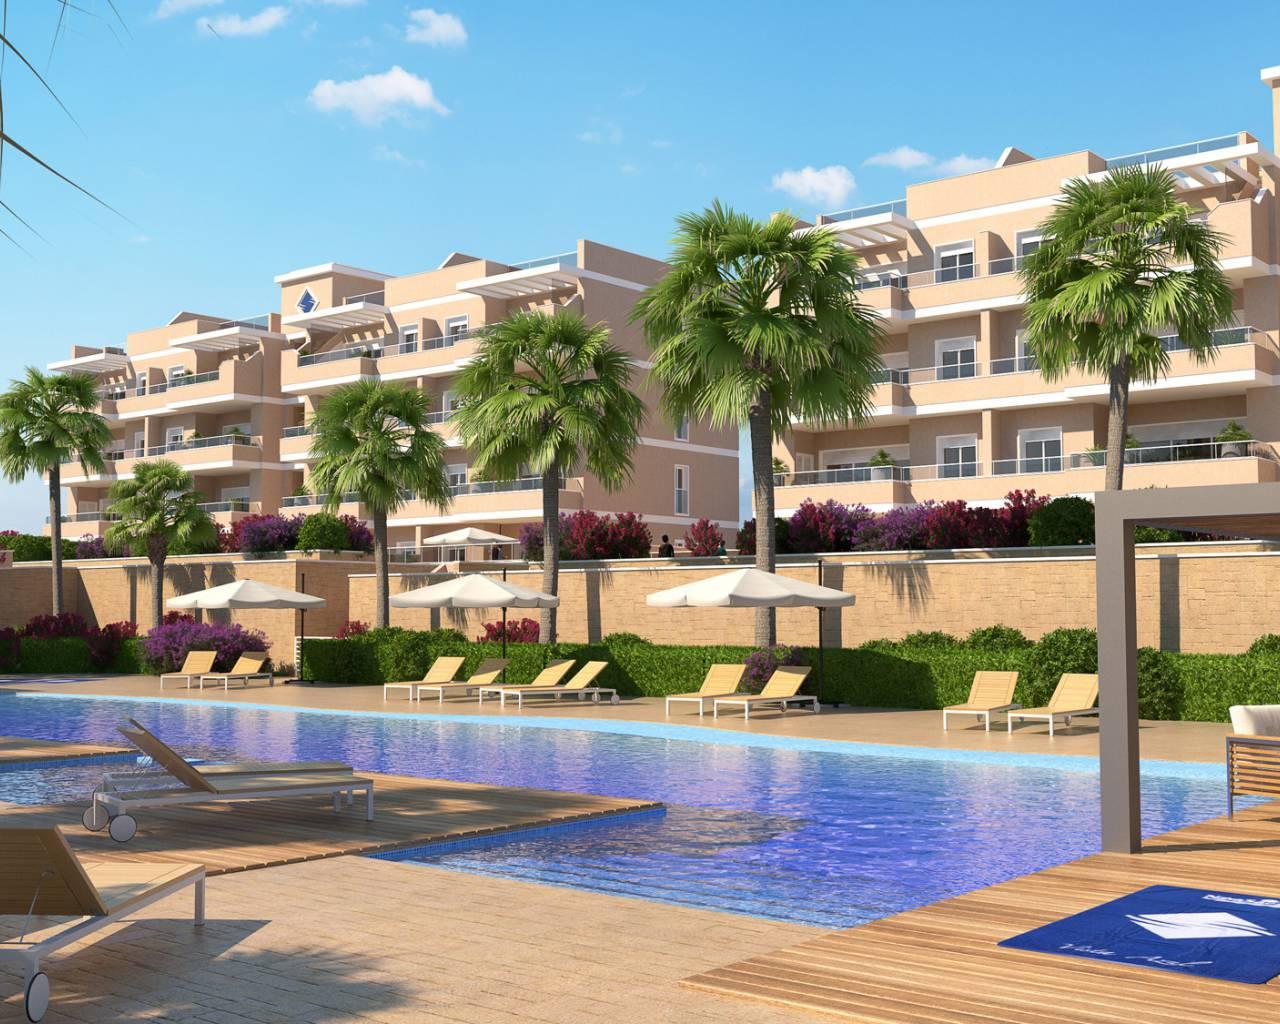 nieuwbouw-appartement-orihuela-costa-villamartin-golf_1908_xl